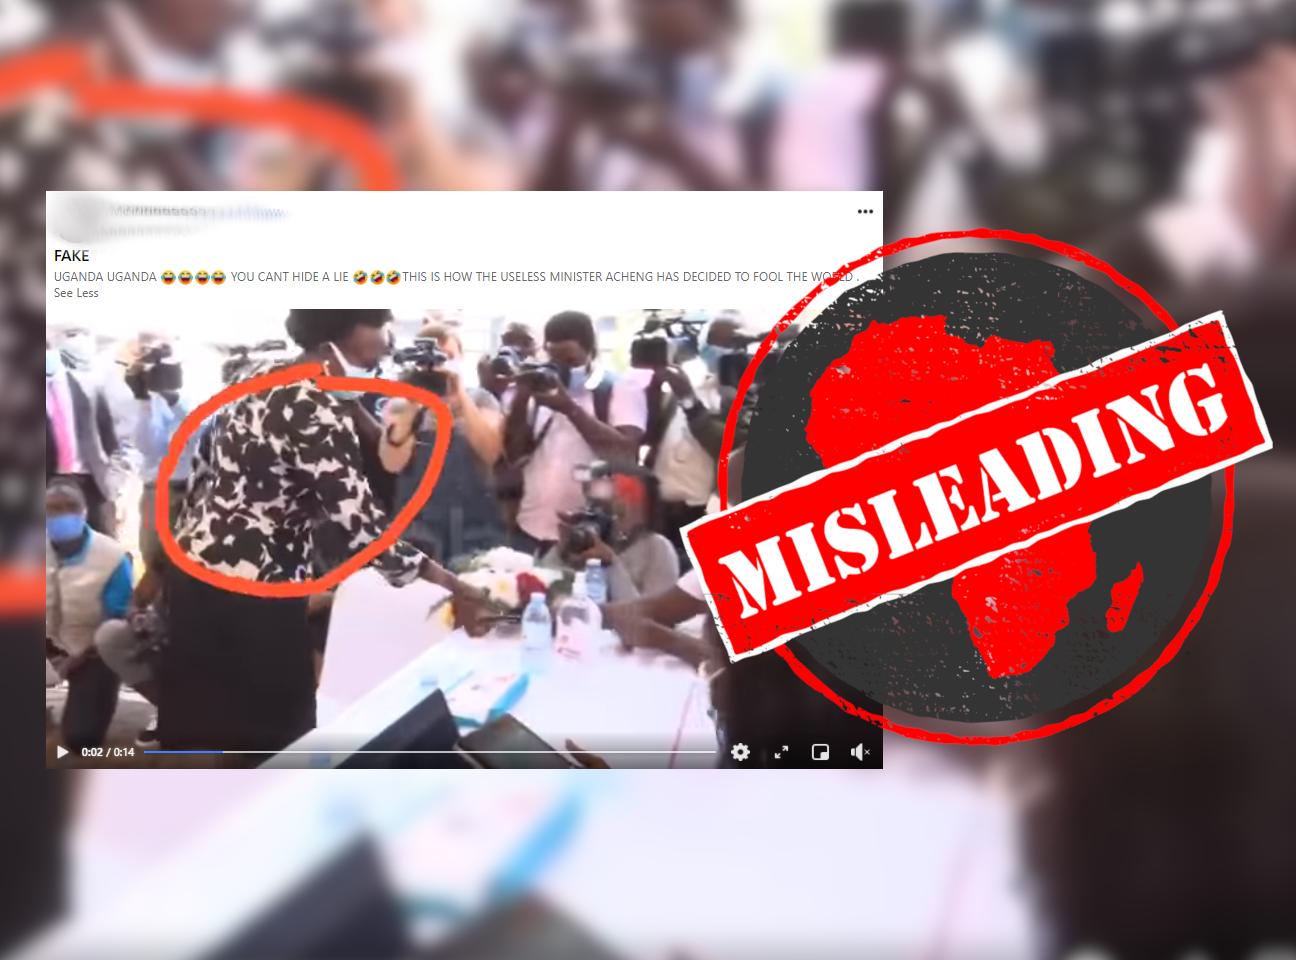 Uganda_Misleading